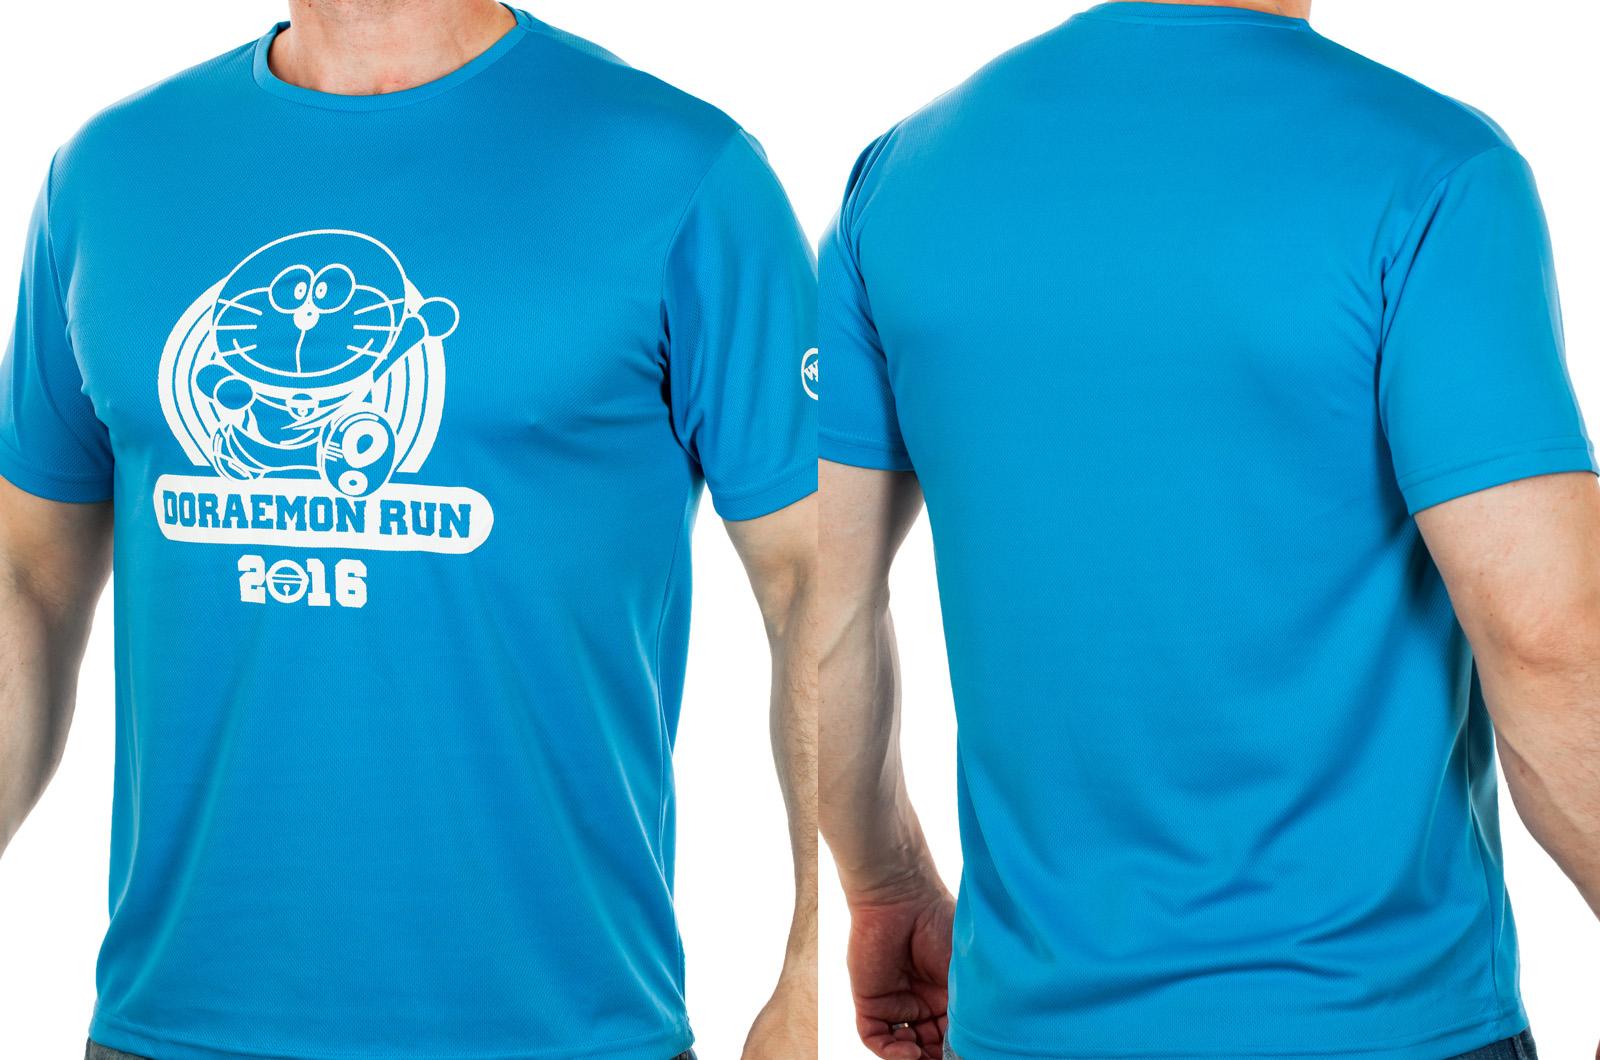 Бирюзовая футболка для мужчин от ТМ Wankee Group. Авторский геймерский дизайн